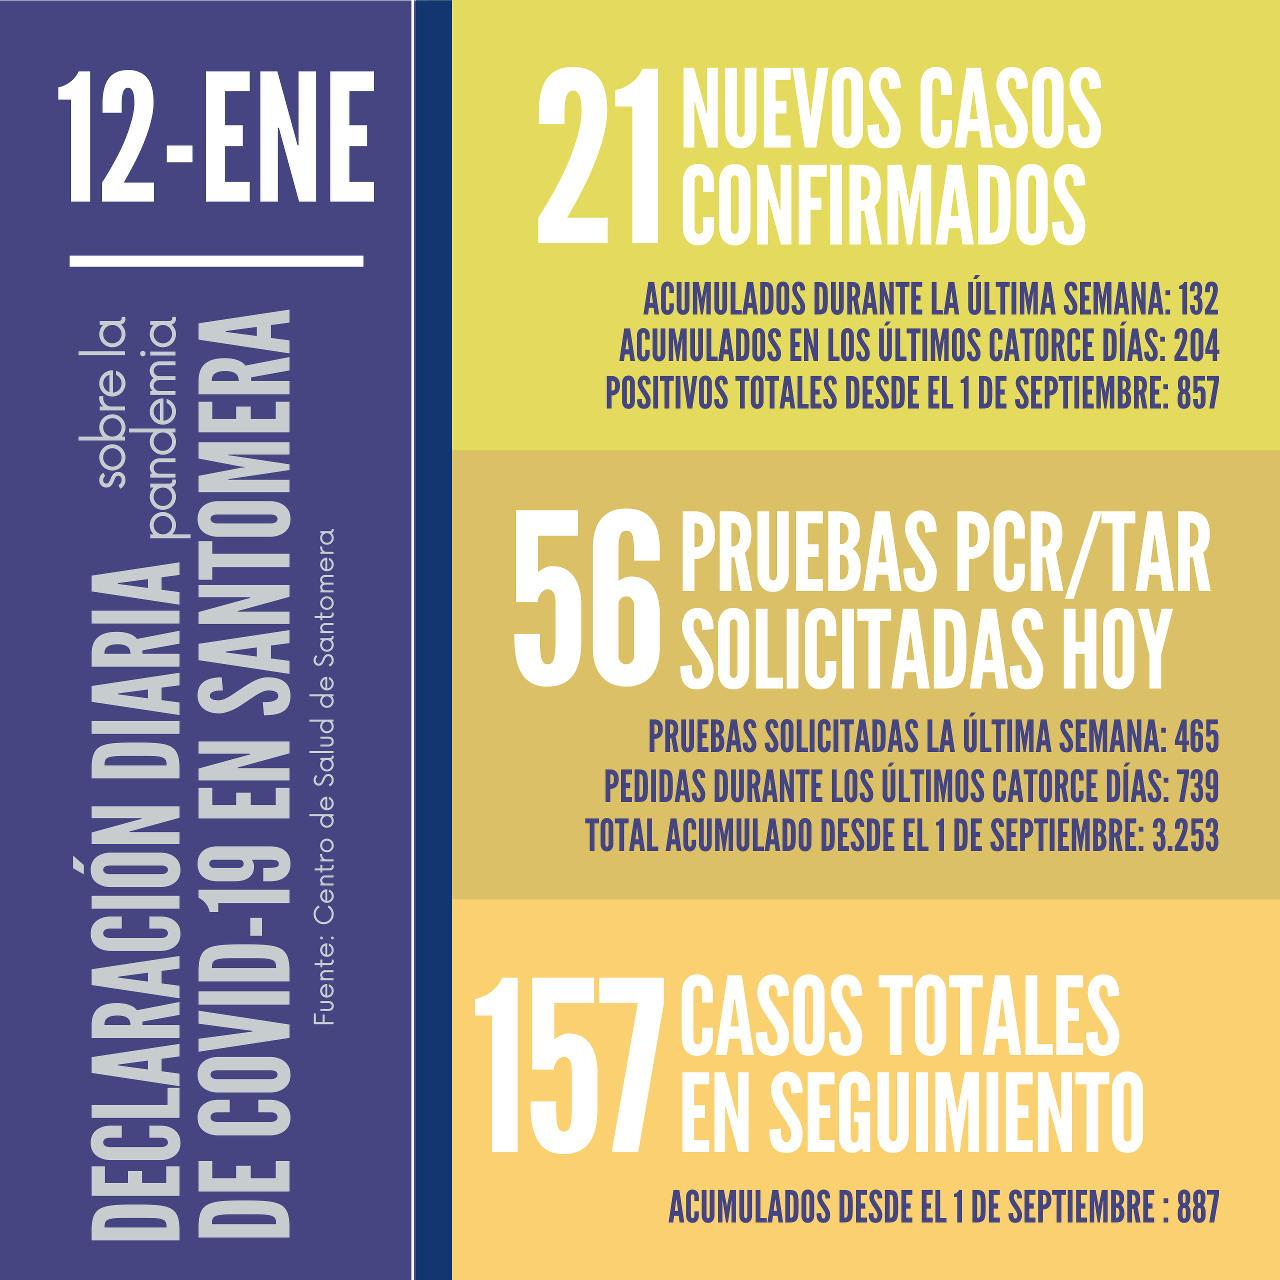 20210112_Datos COVID-19 Santomera